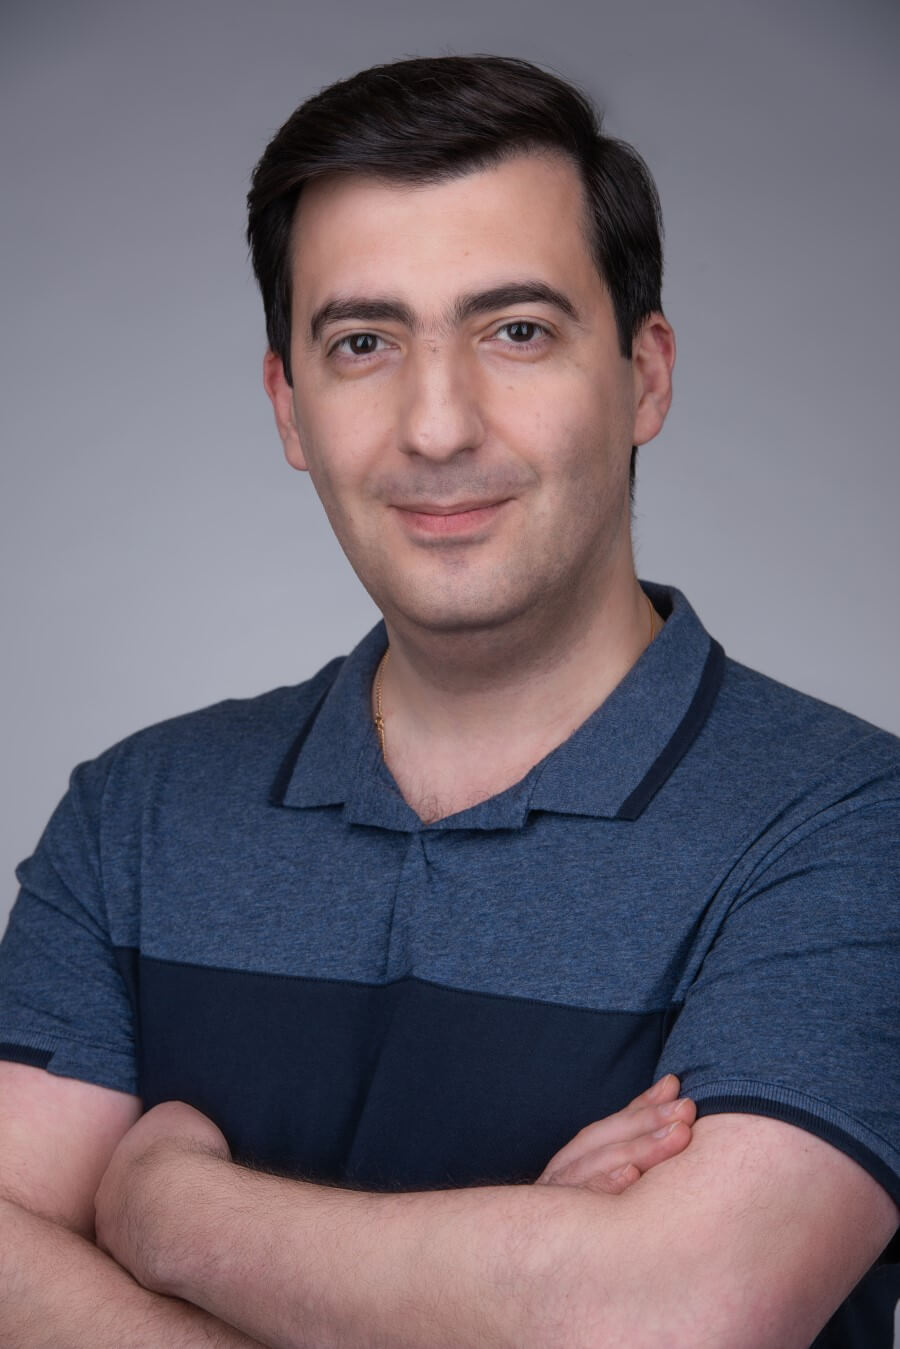 Армен Аветисян Вице-президент по региональному развитию